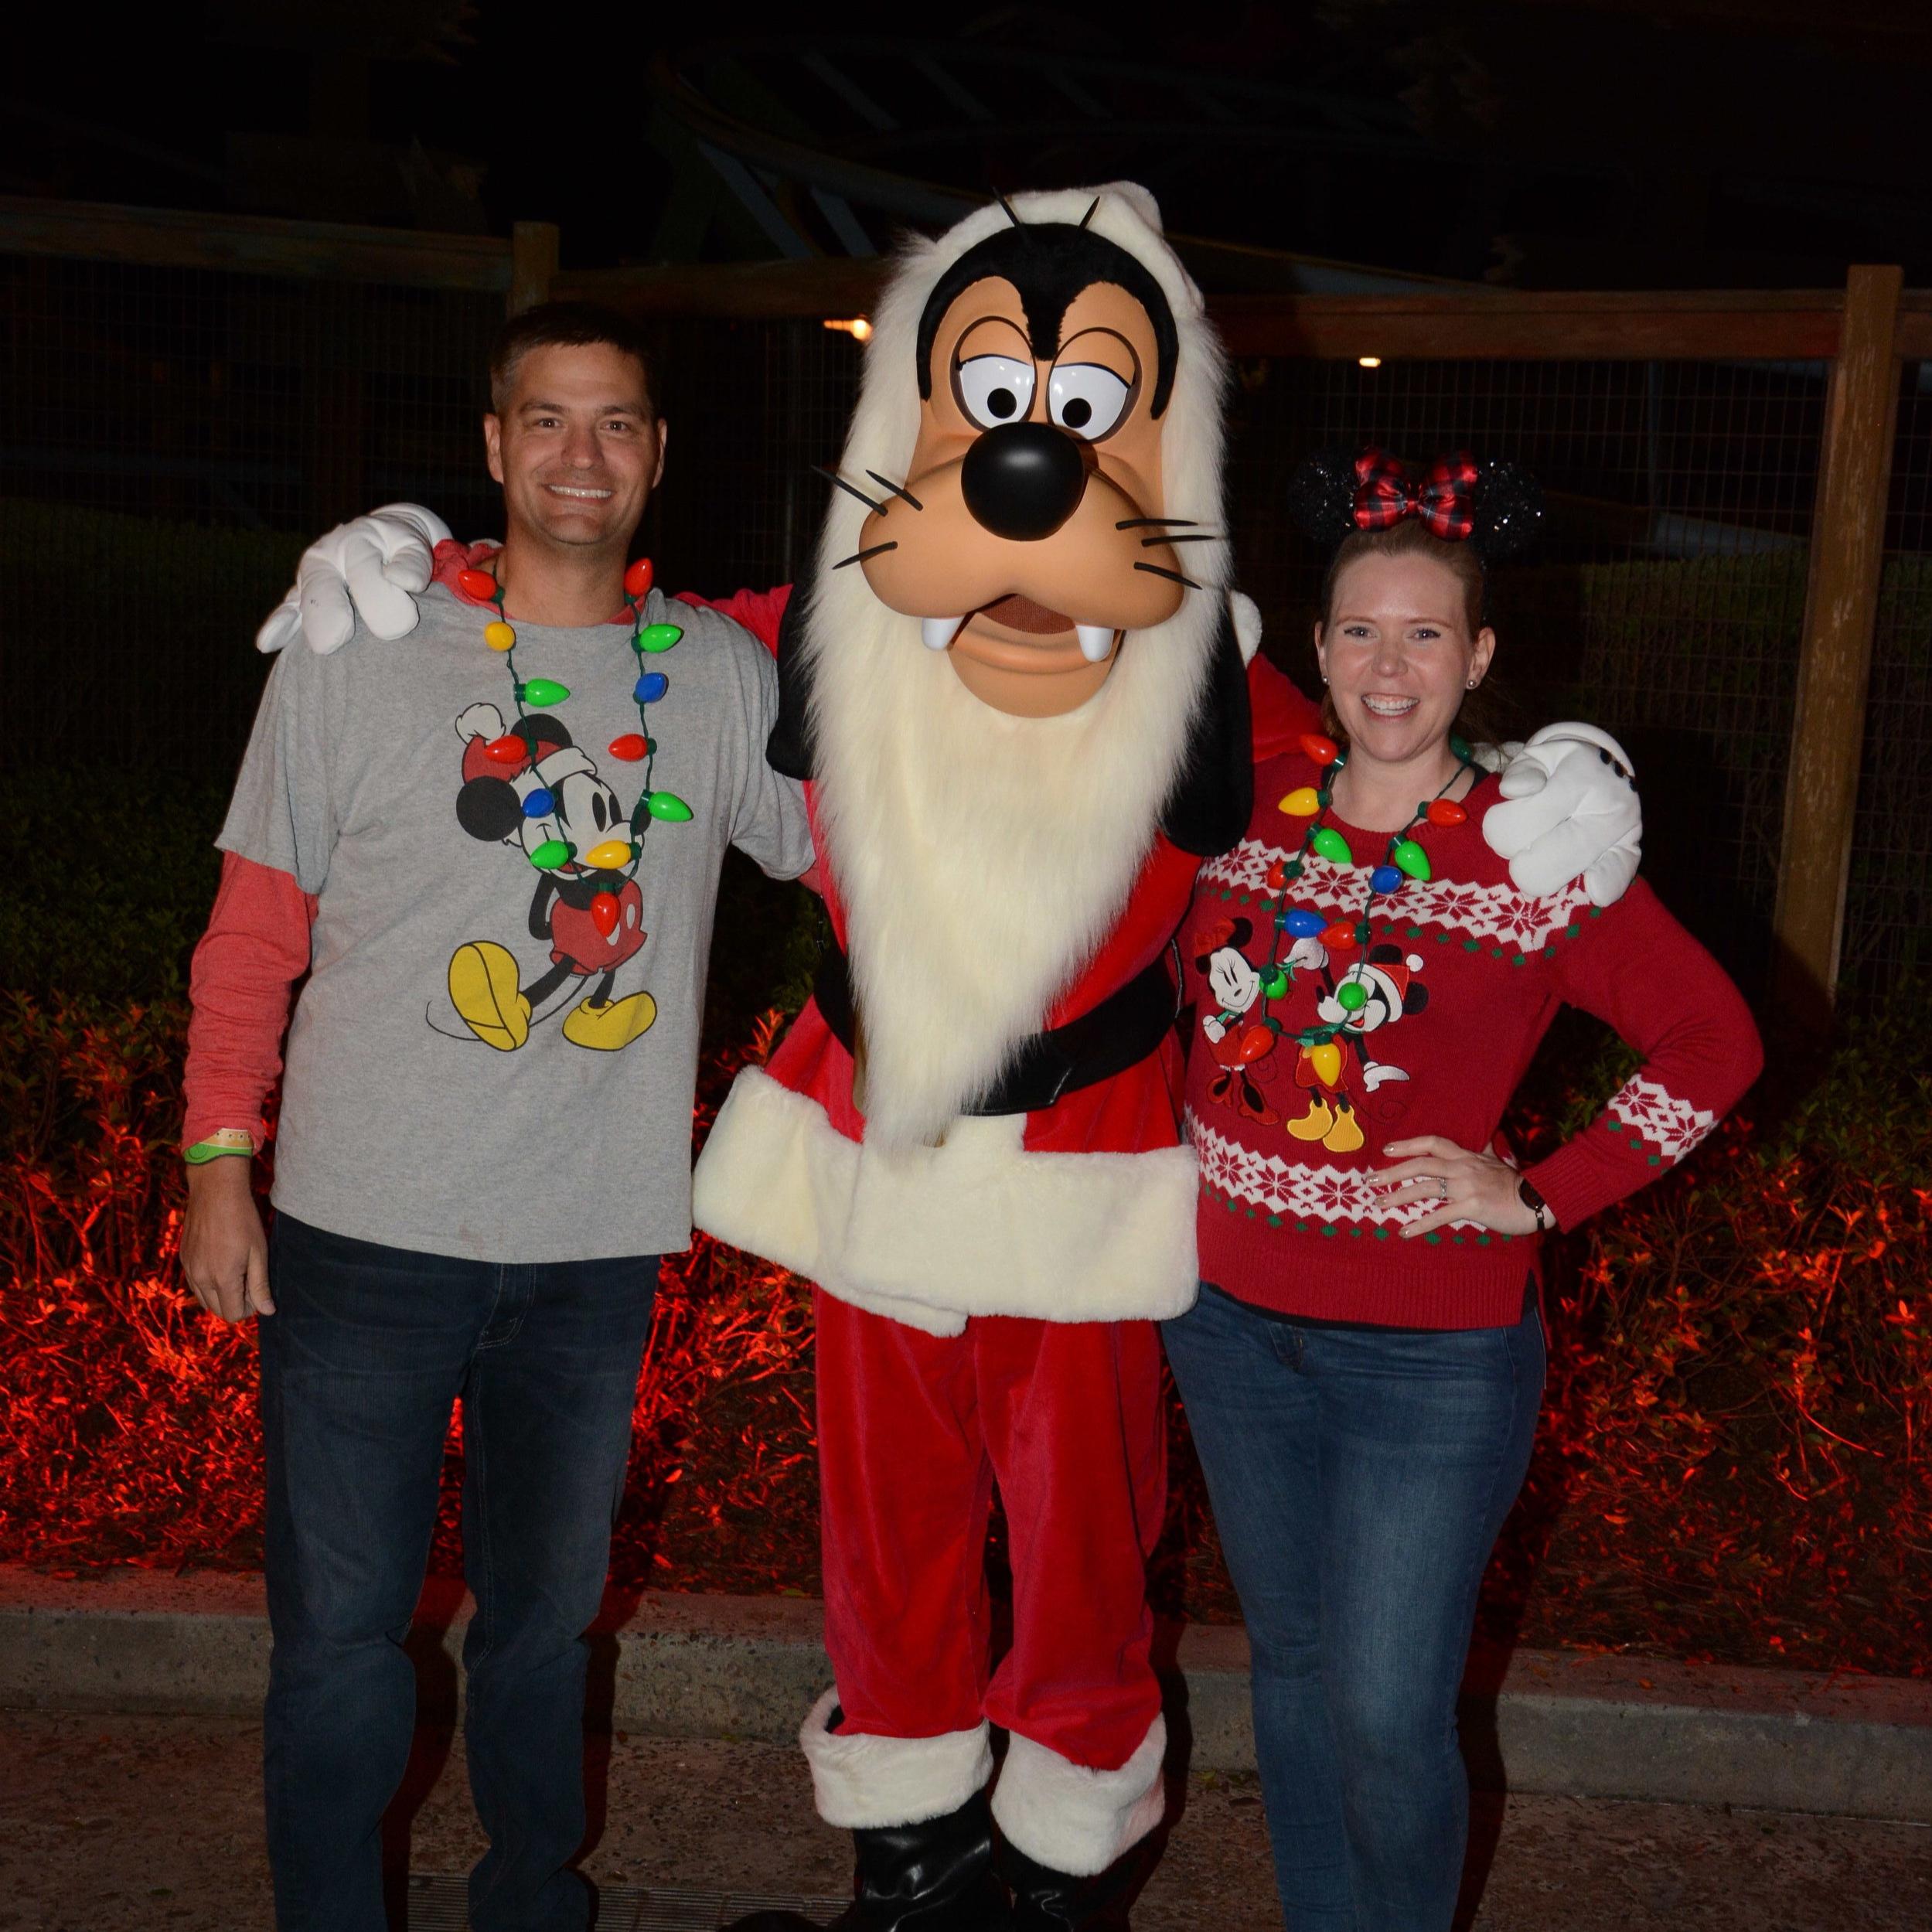 We did meet Goofy in santa attire.